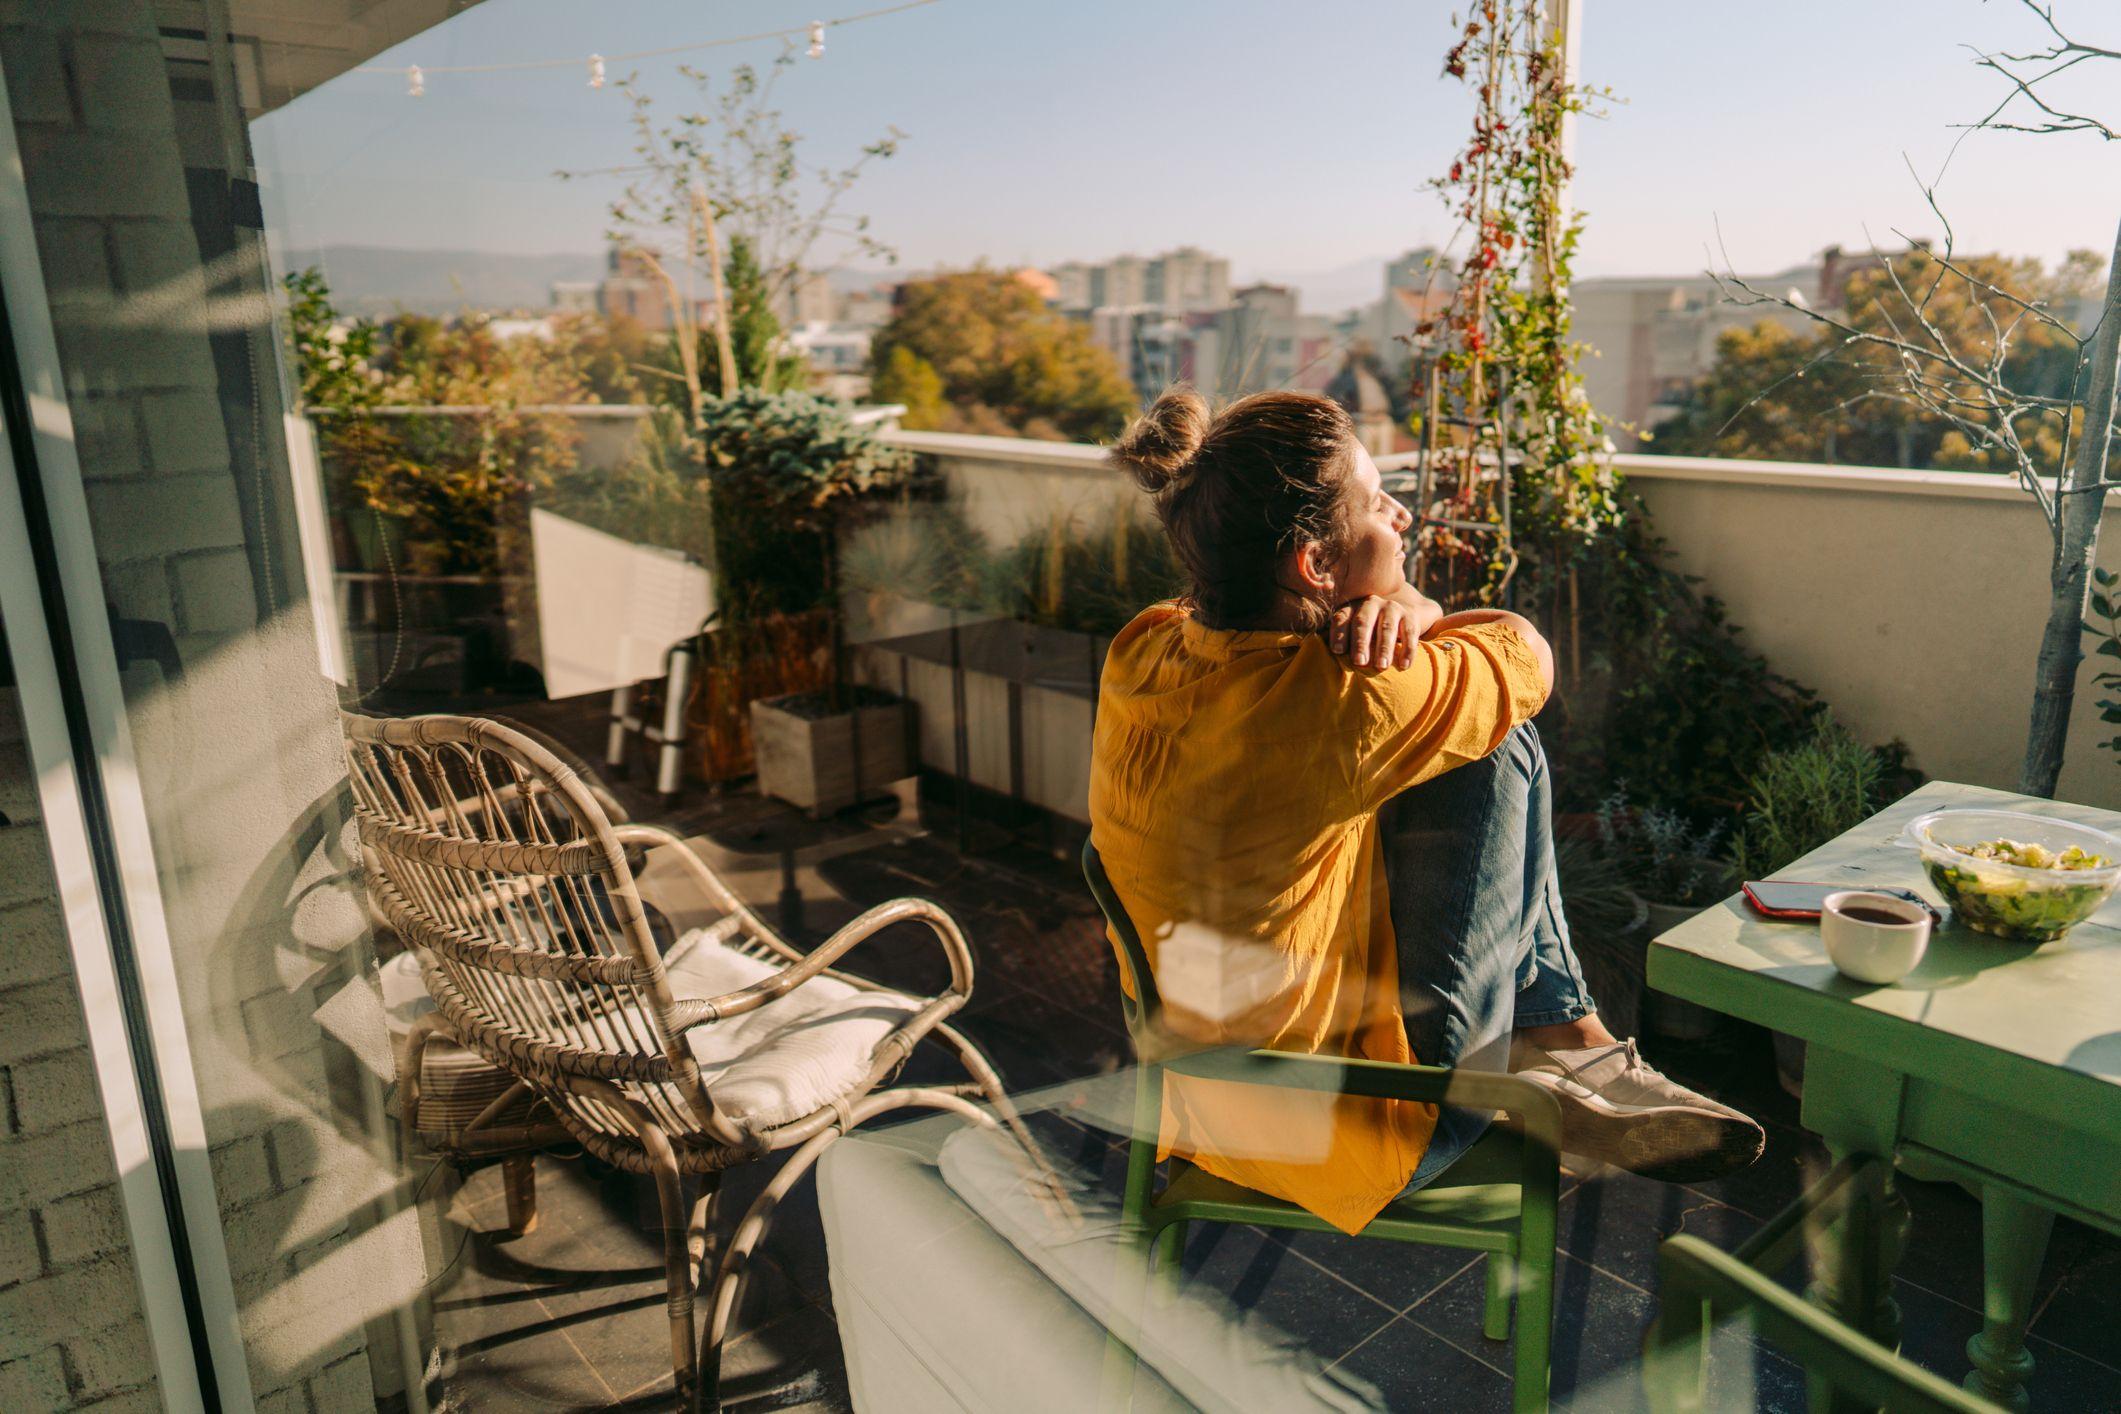 Dame som nyter sola på en frodig balkong